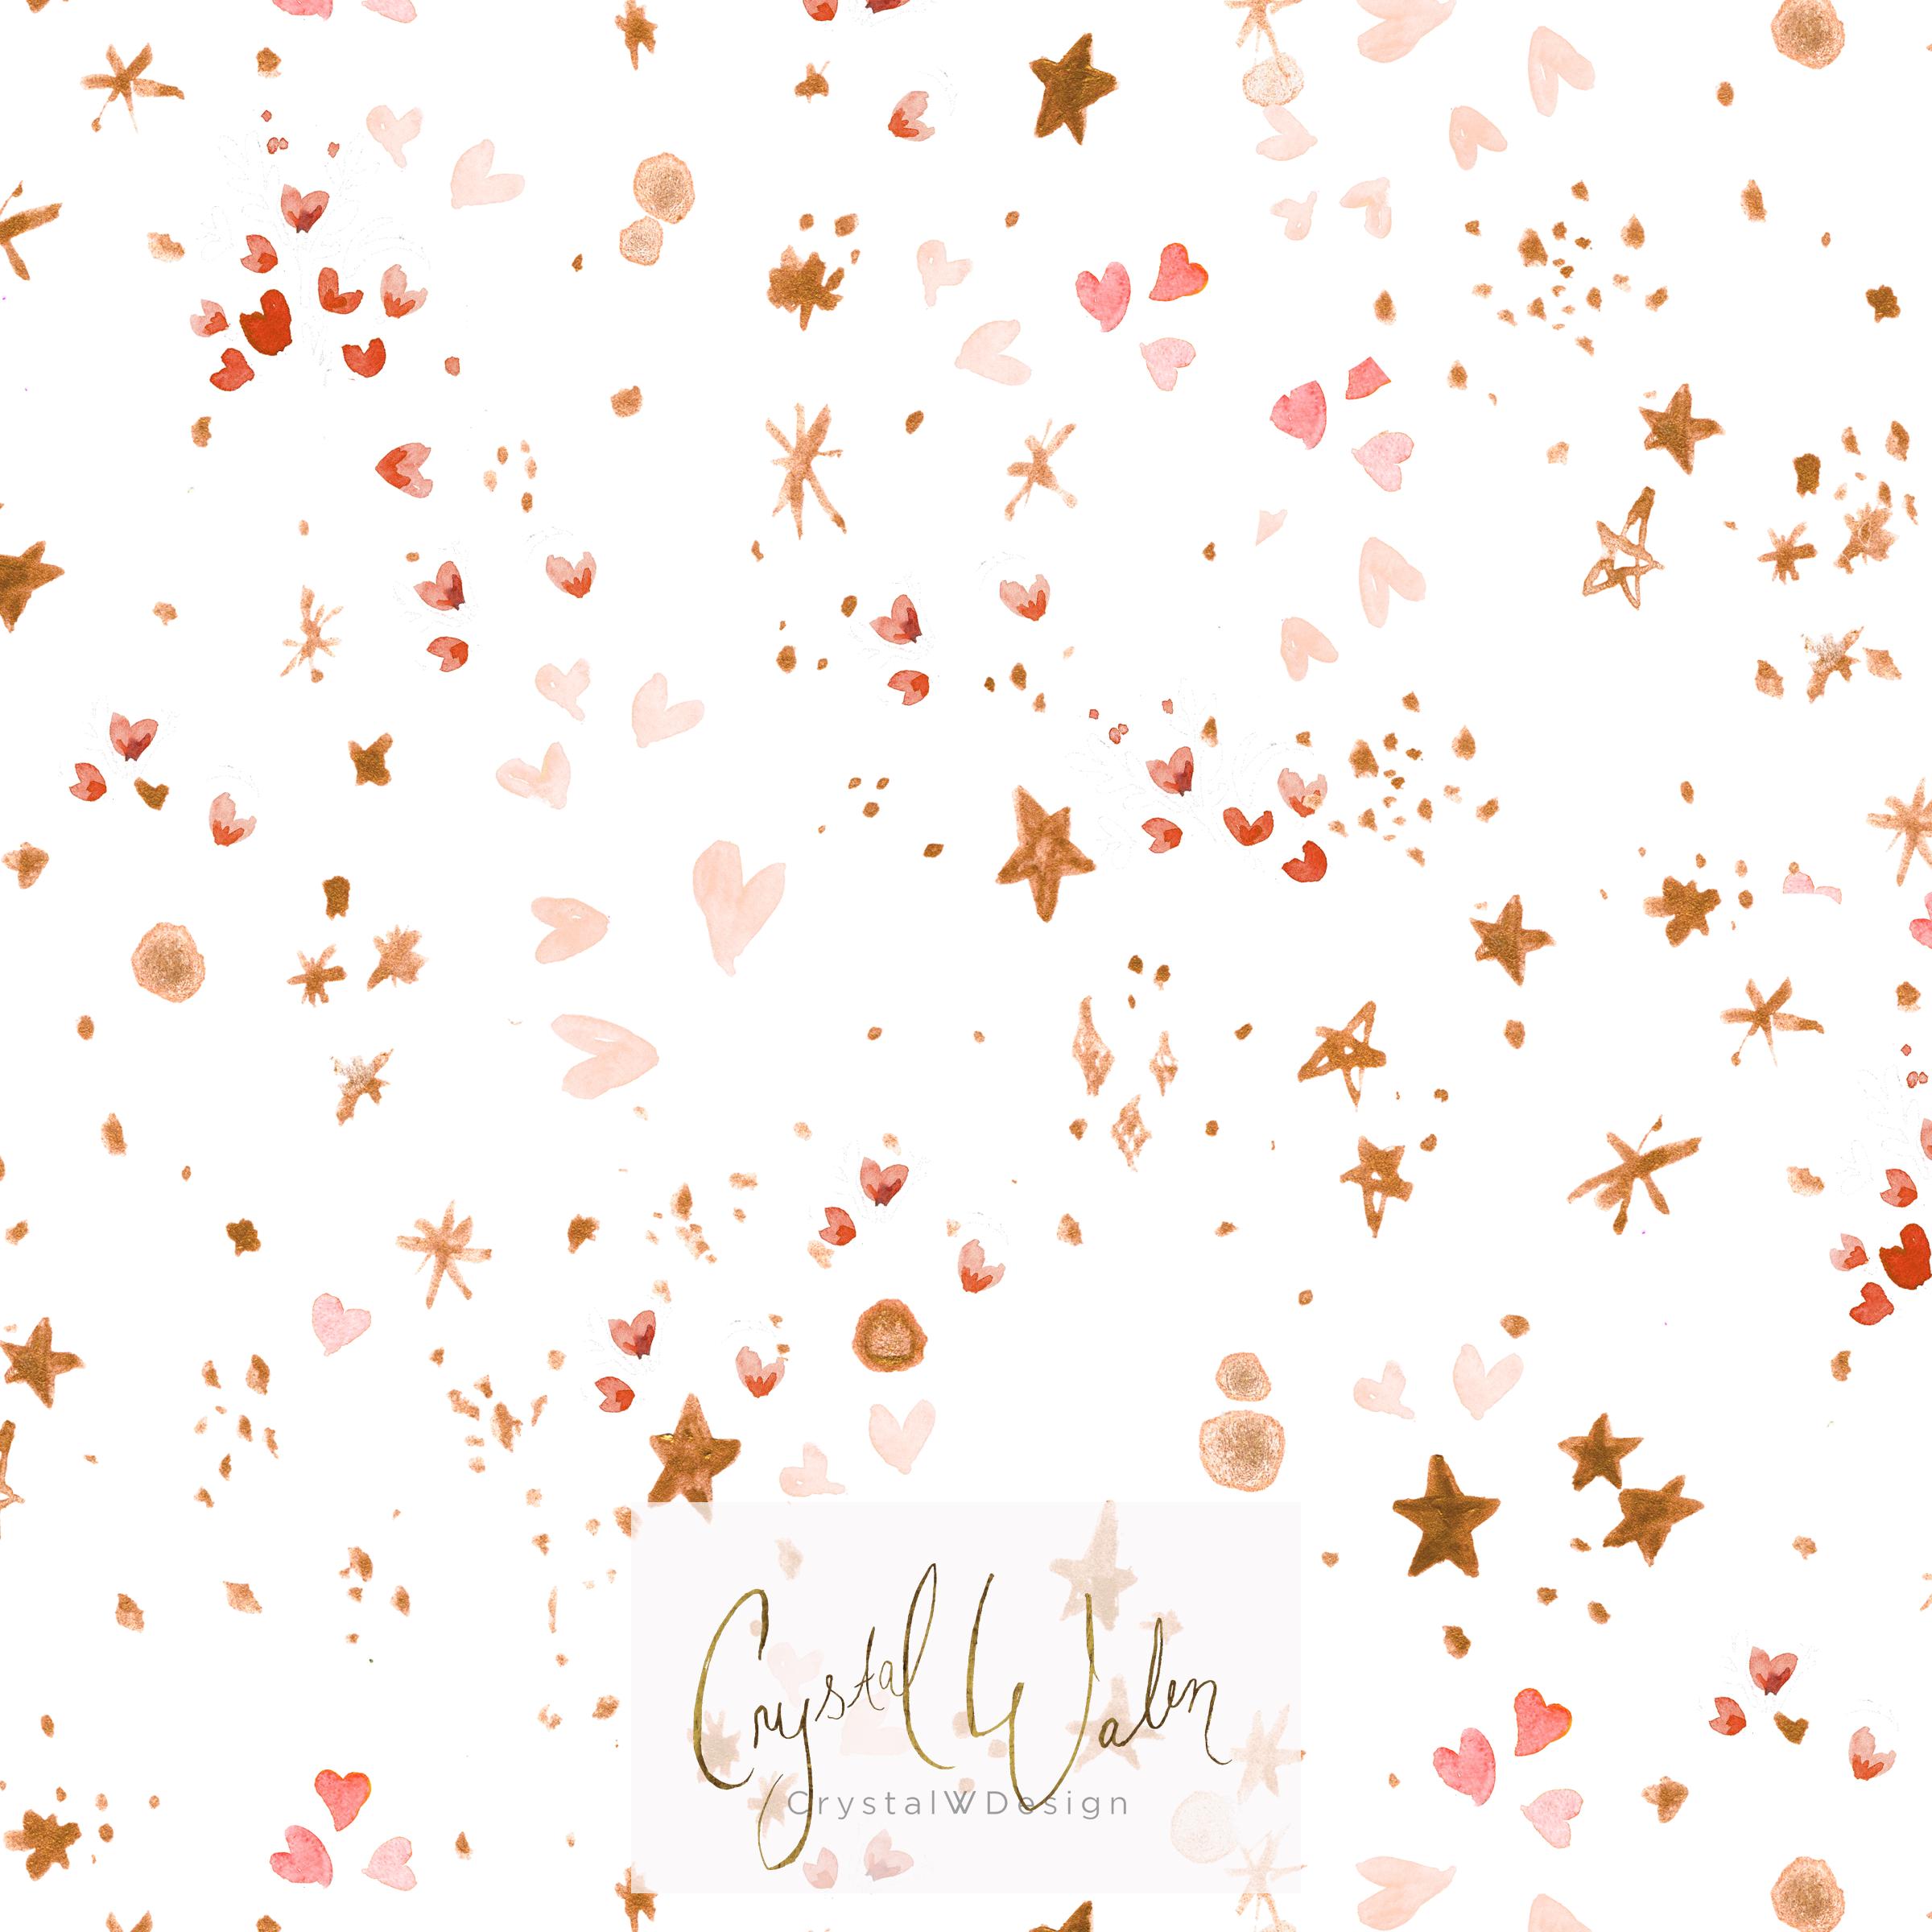 Hearts + Stars Splendor